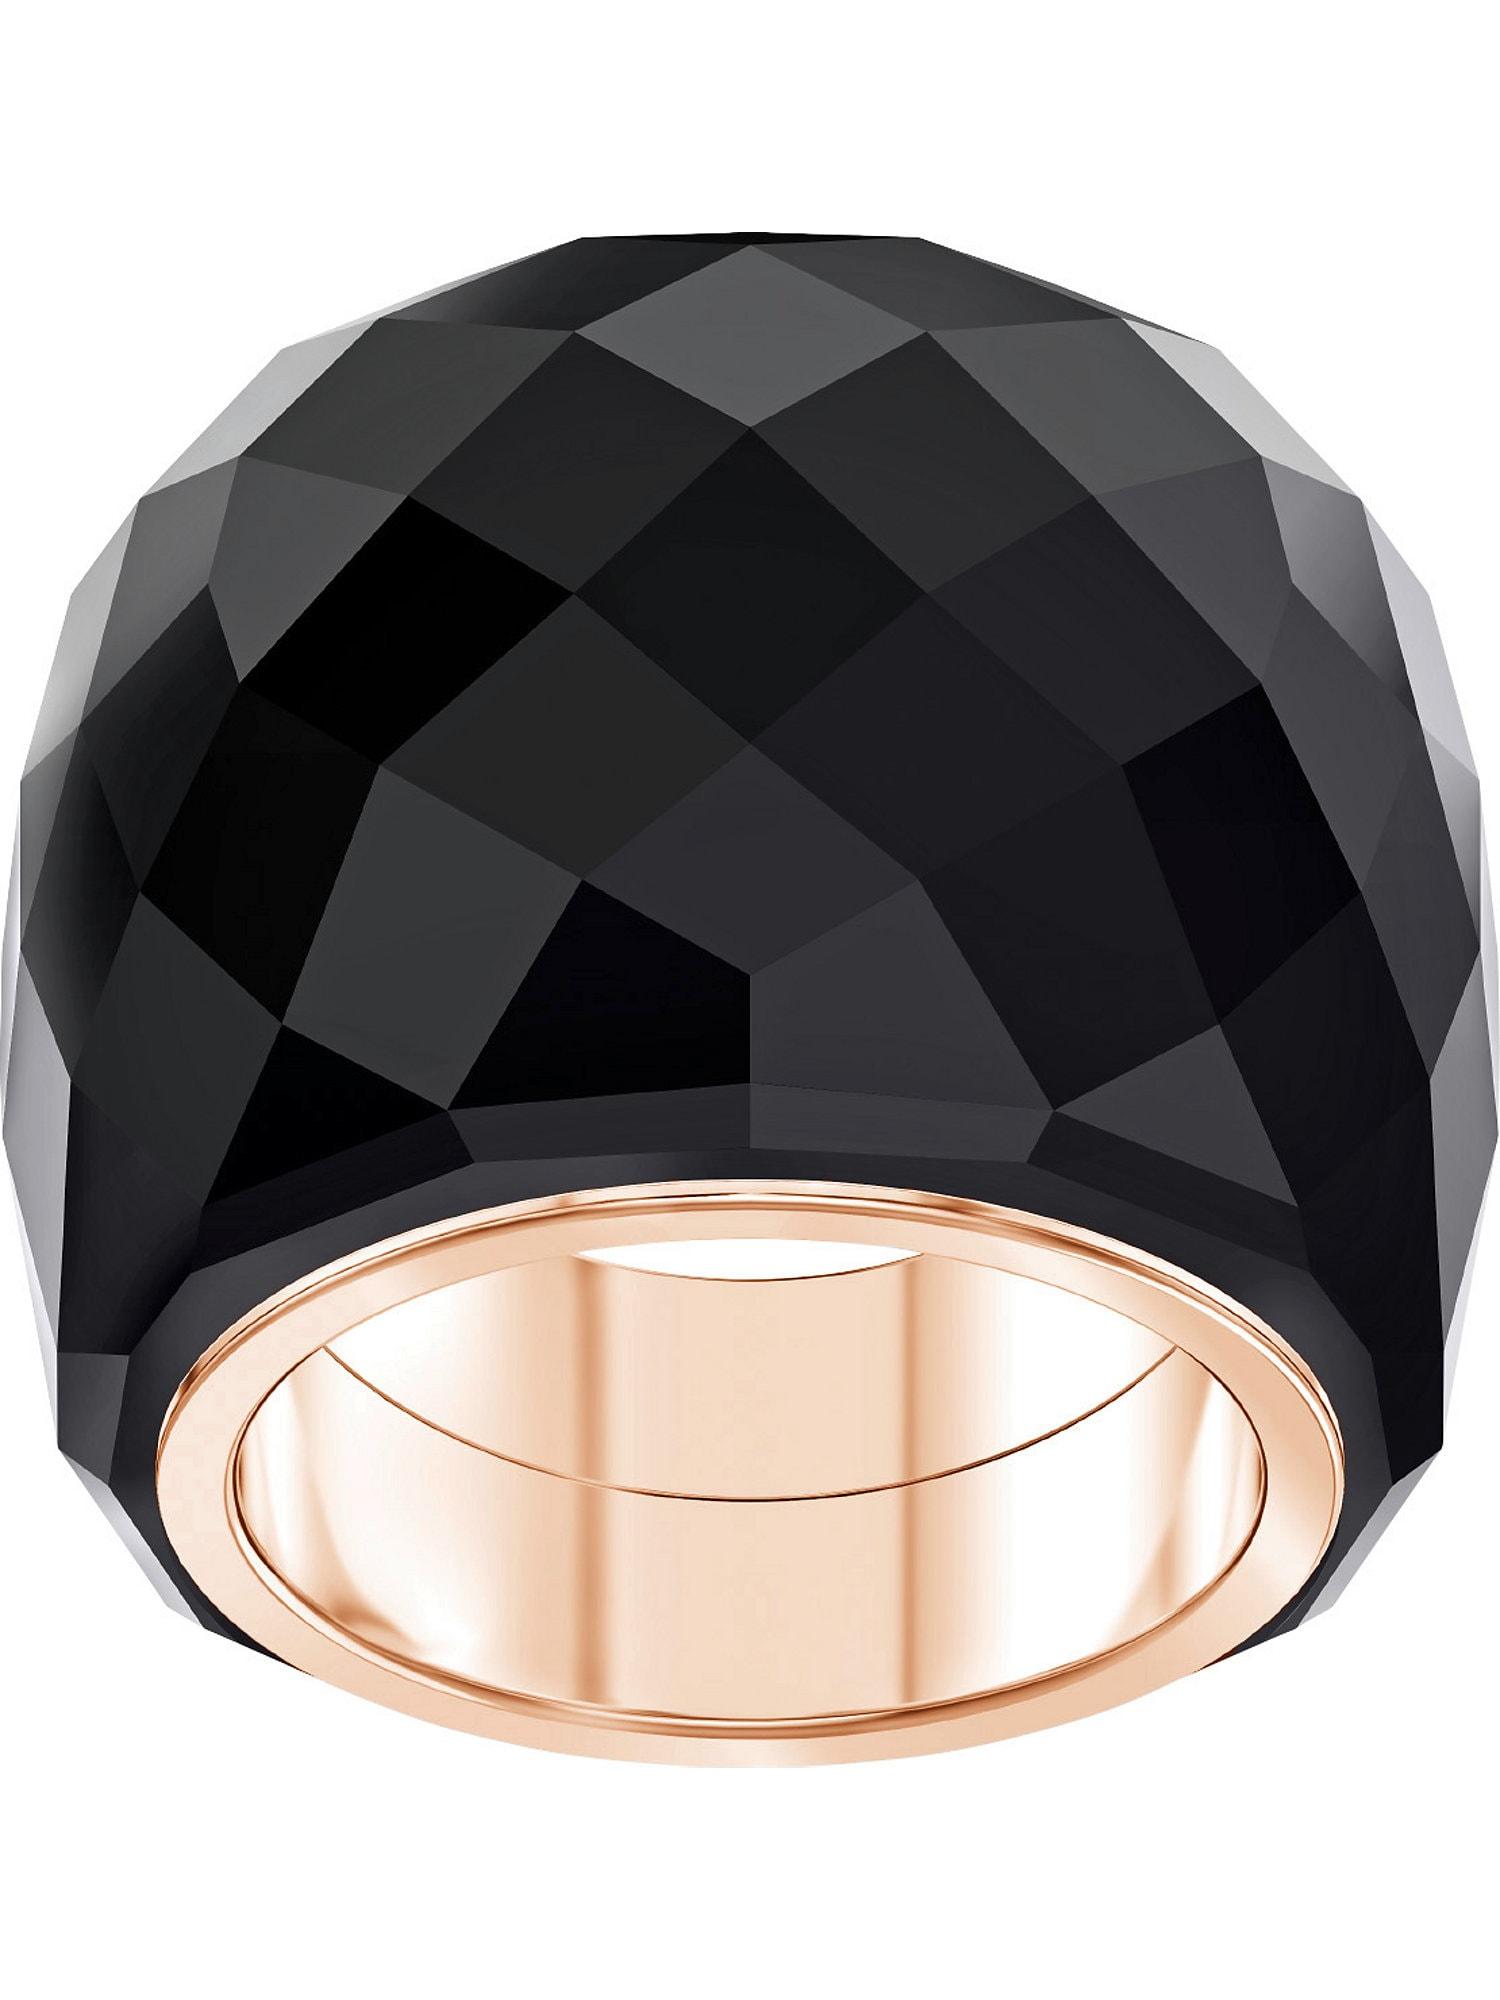 Damen Swarovski Ring 'Nirvana' blau,  gold, gold,  schwarz, orange, silber,  türkis | 09009654103366